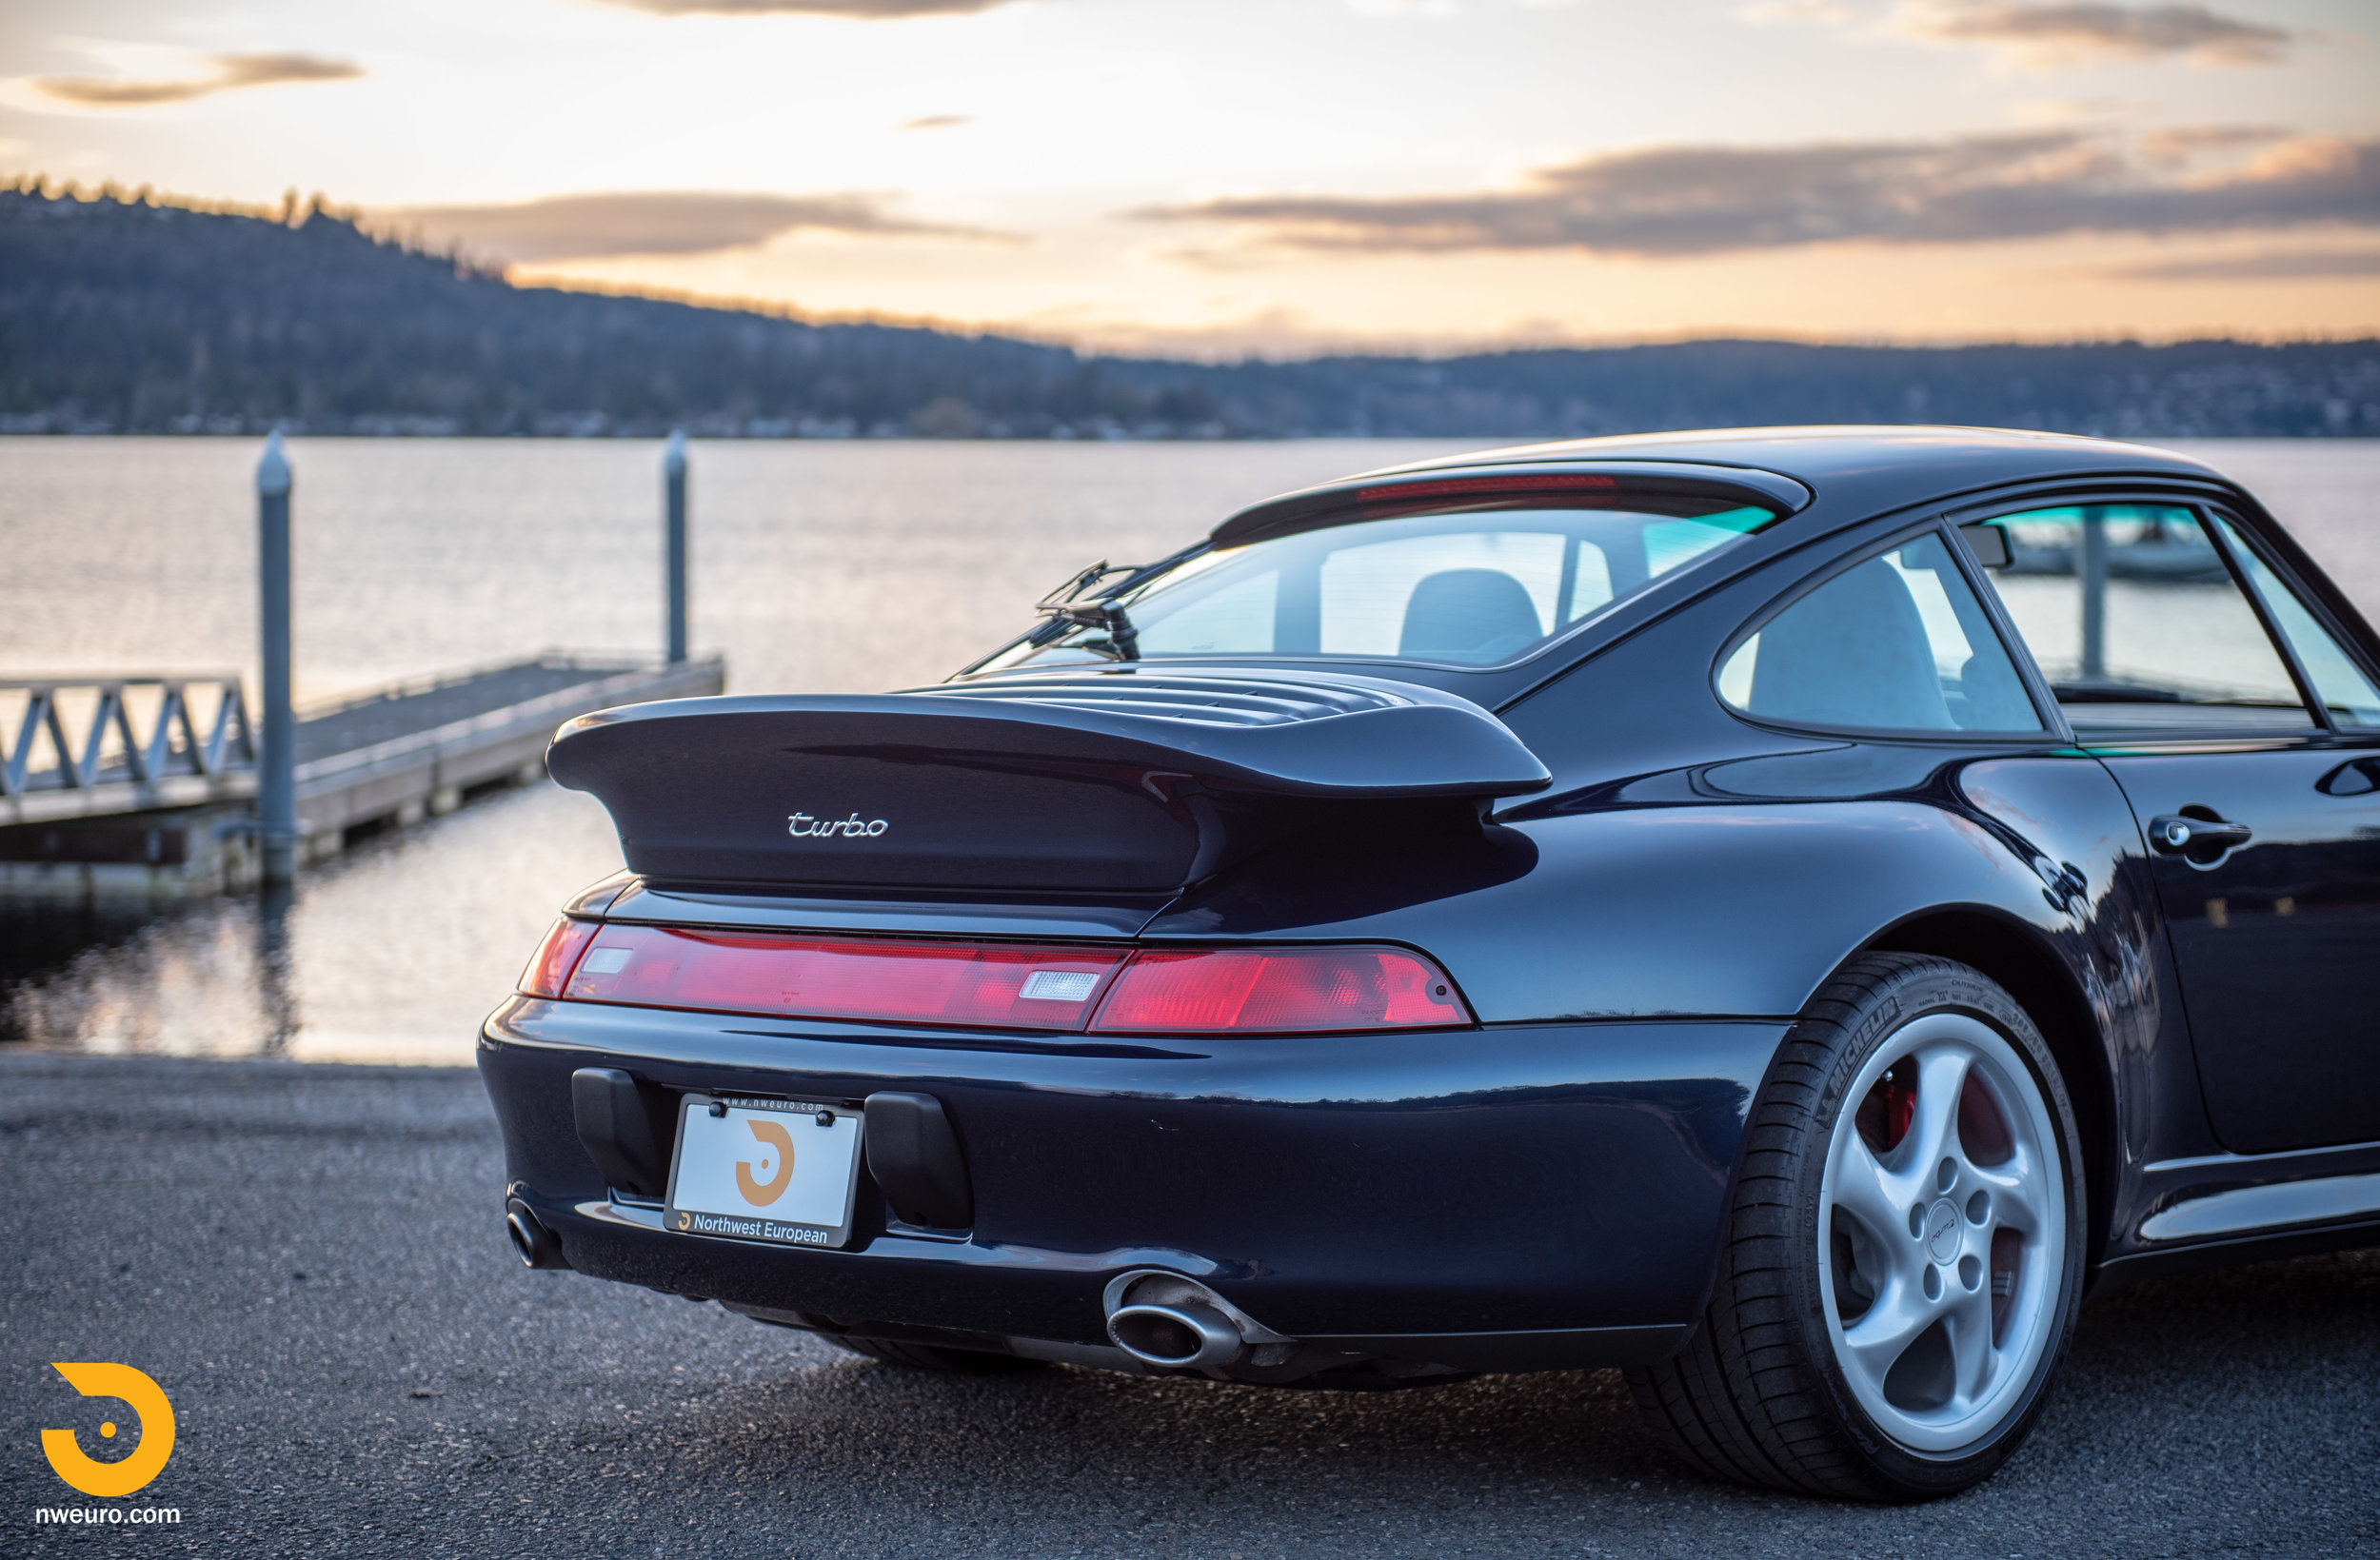 1997 Porsche 993 Turbo Ocean Blue-52.jpg